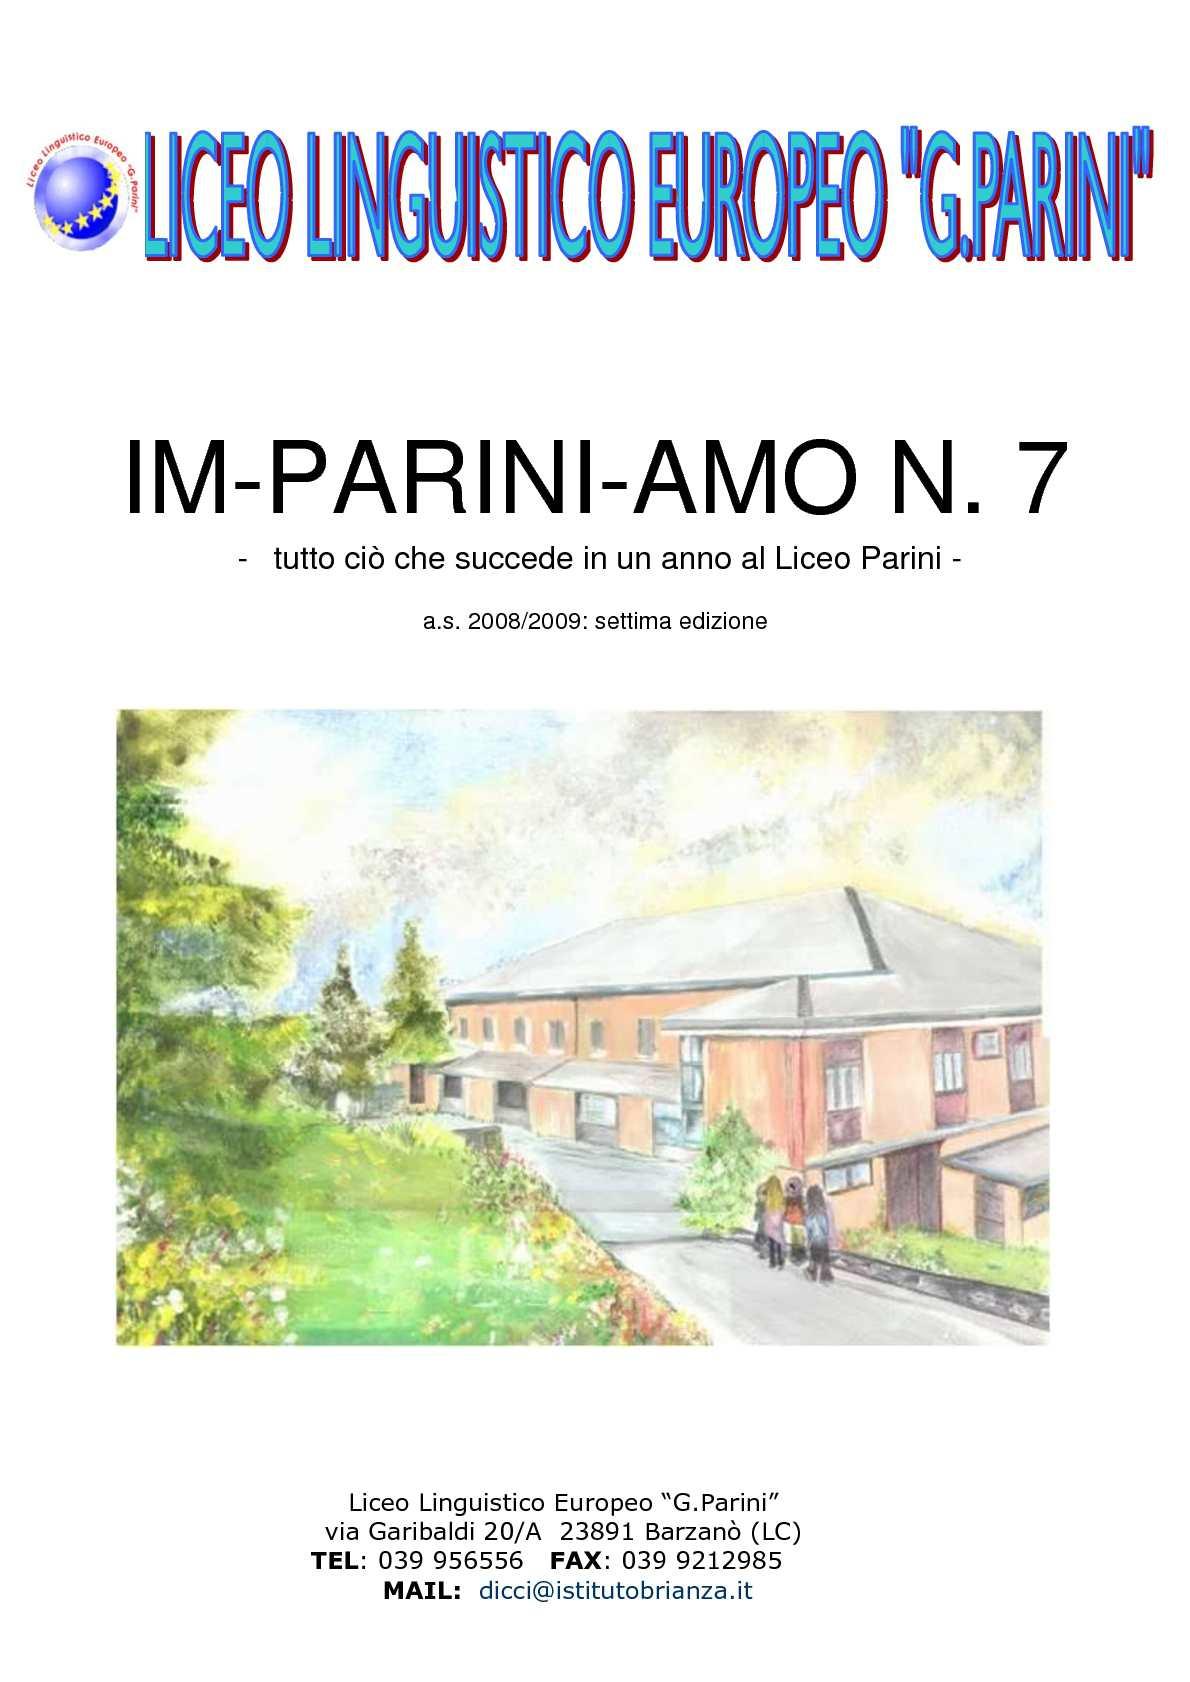 Calaméo Impariniamo 7